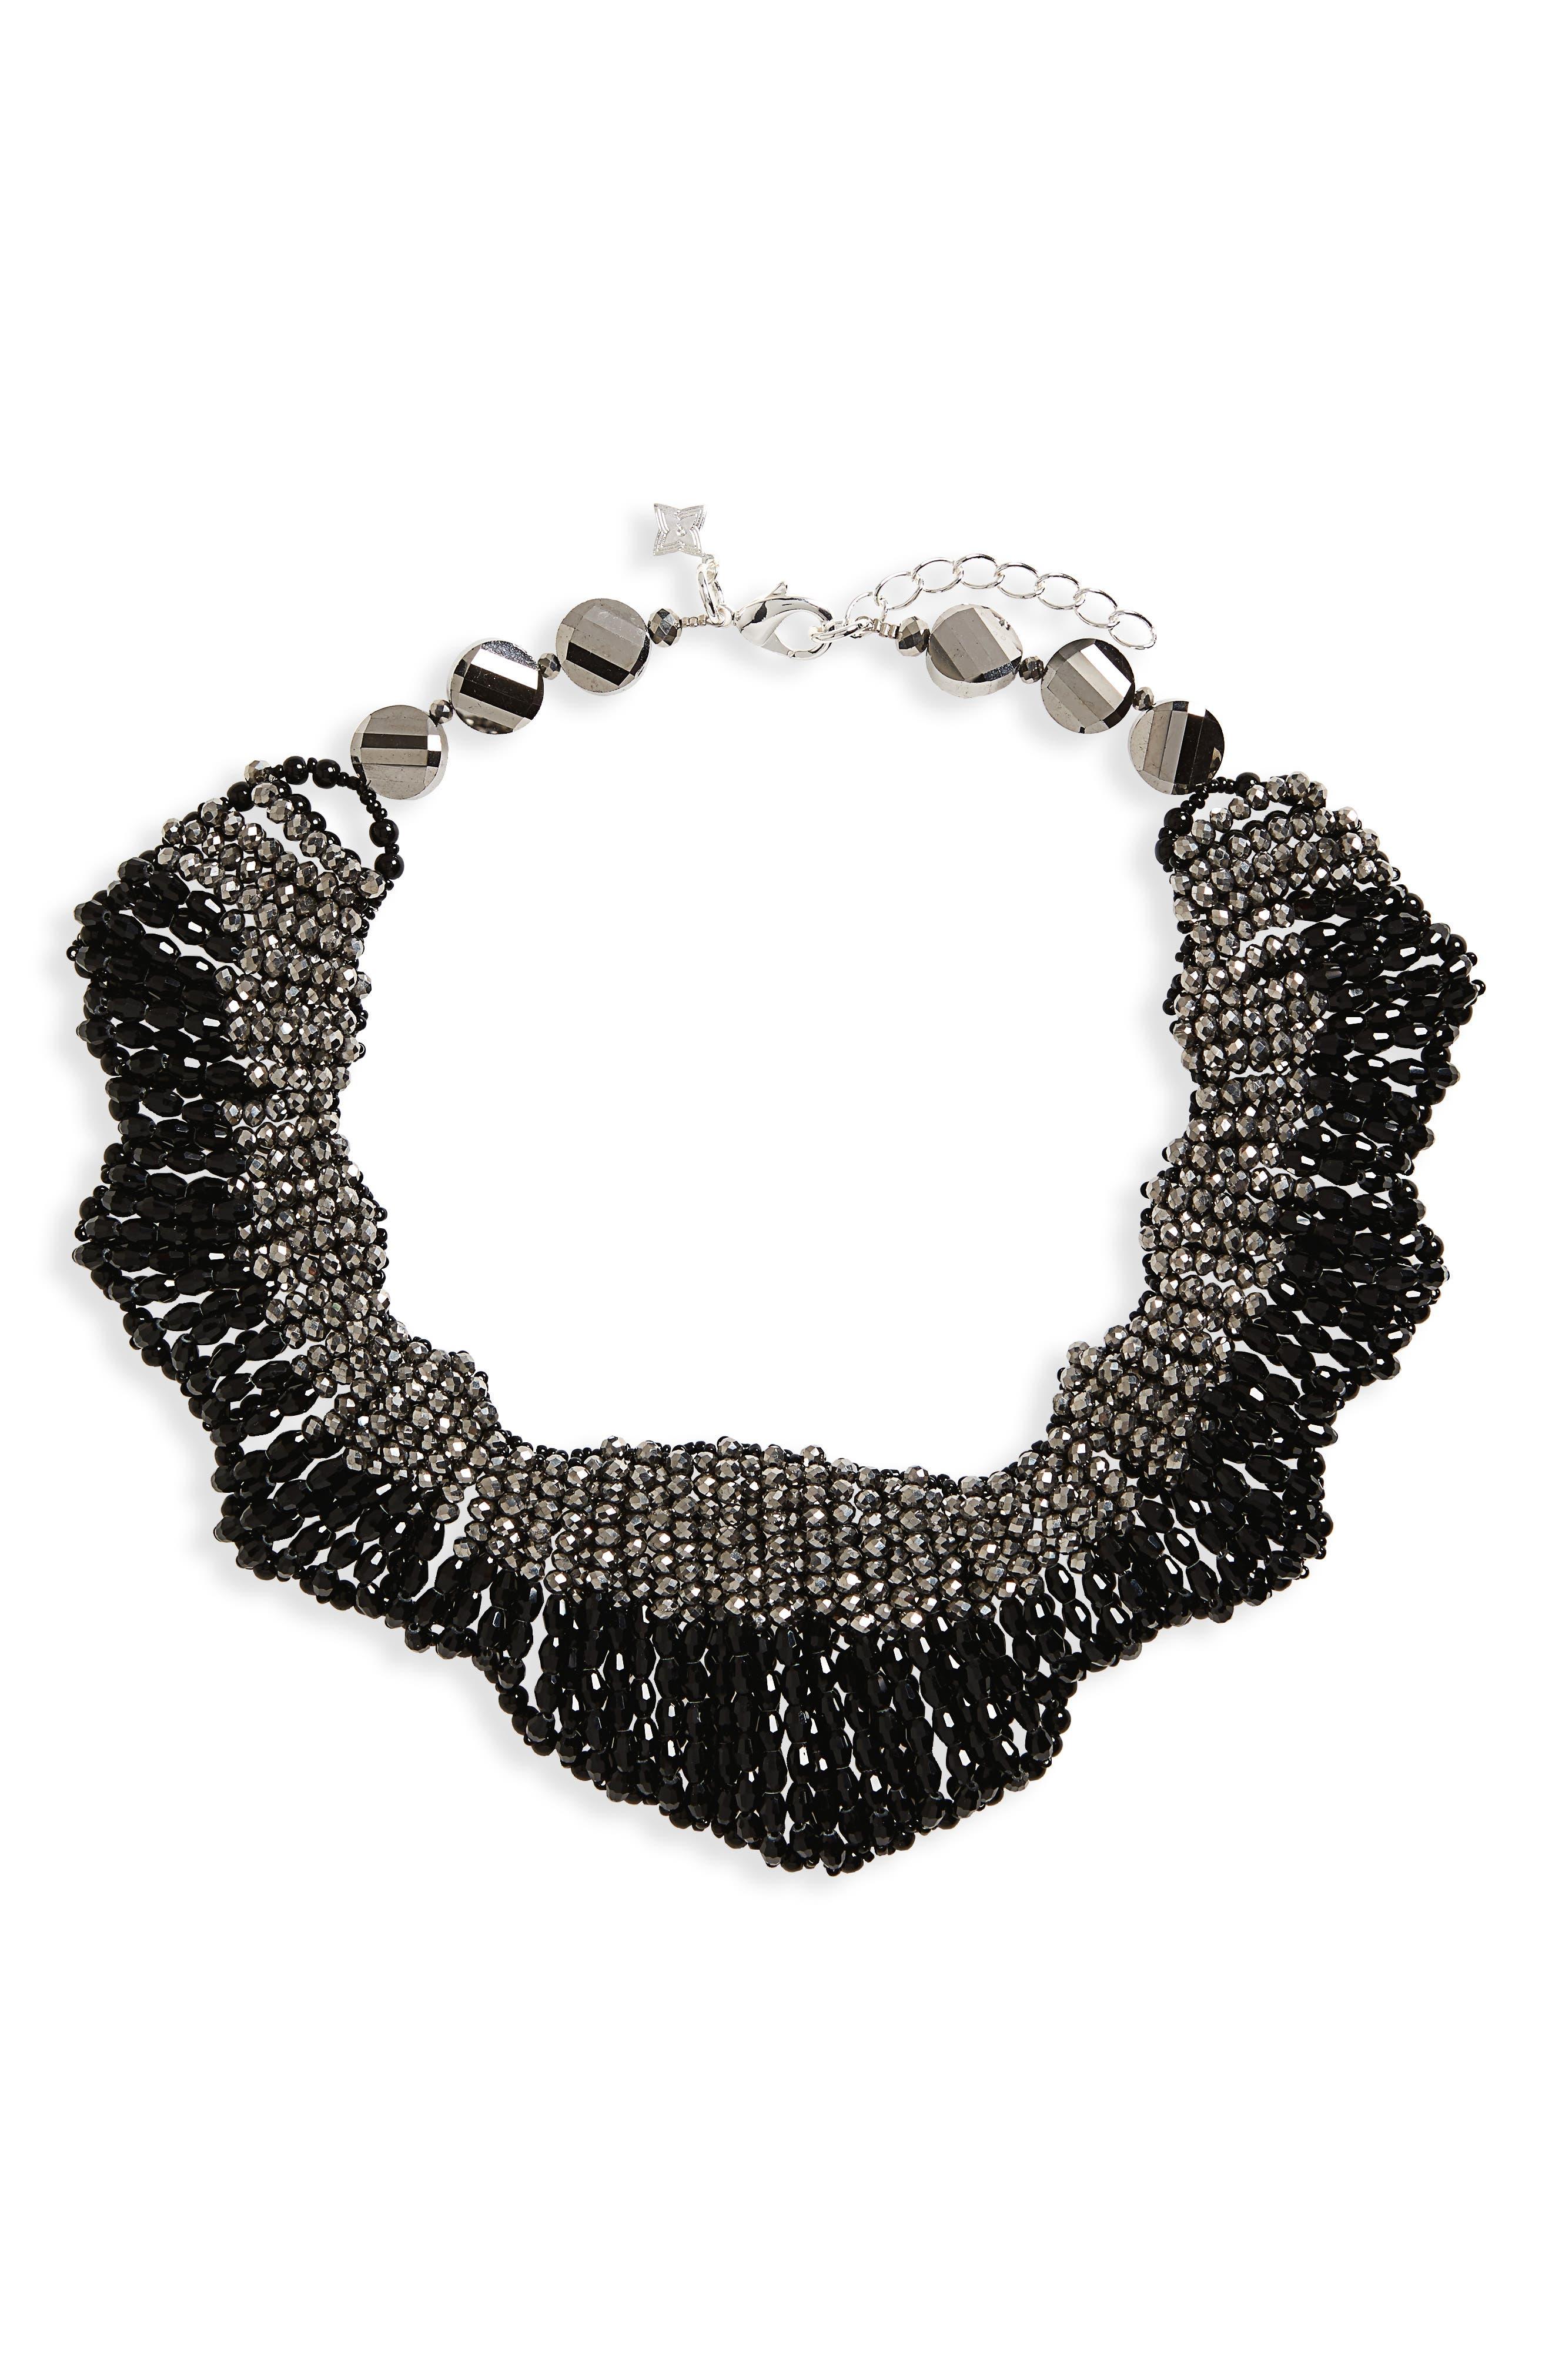 Panacea Beaded Statement Collar Necklace